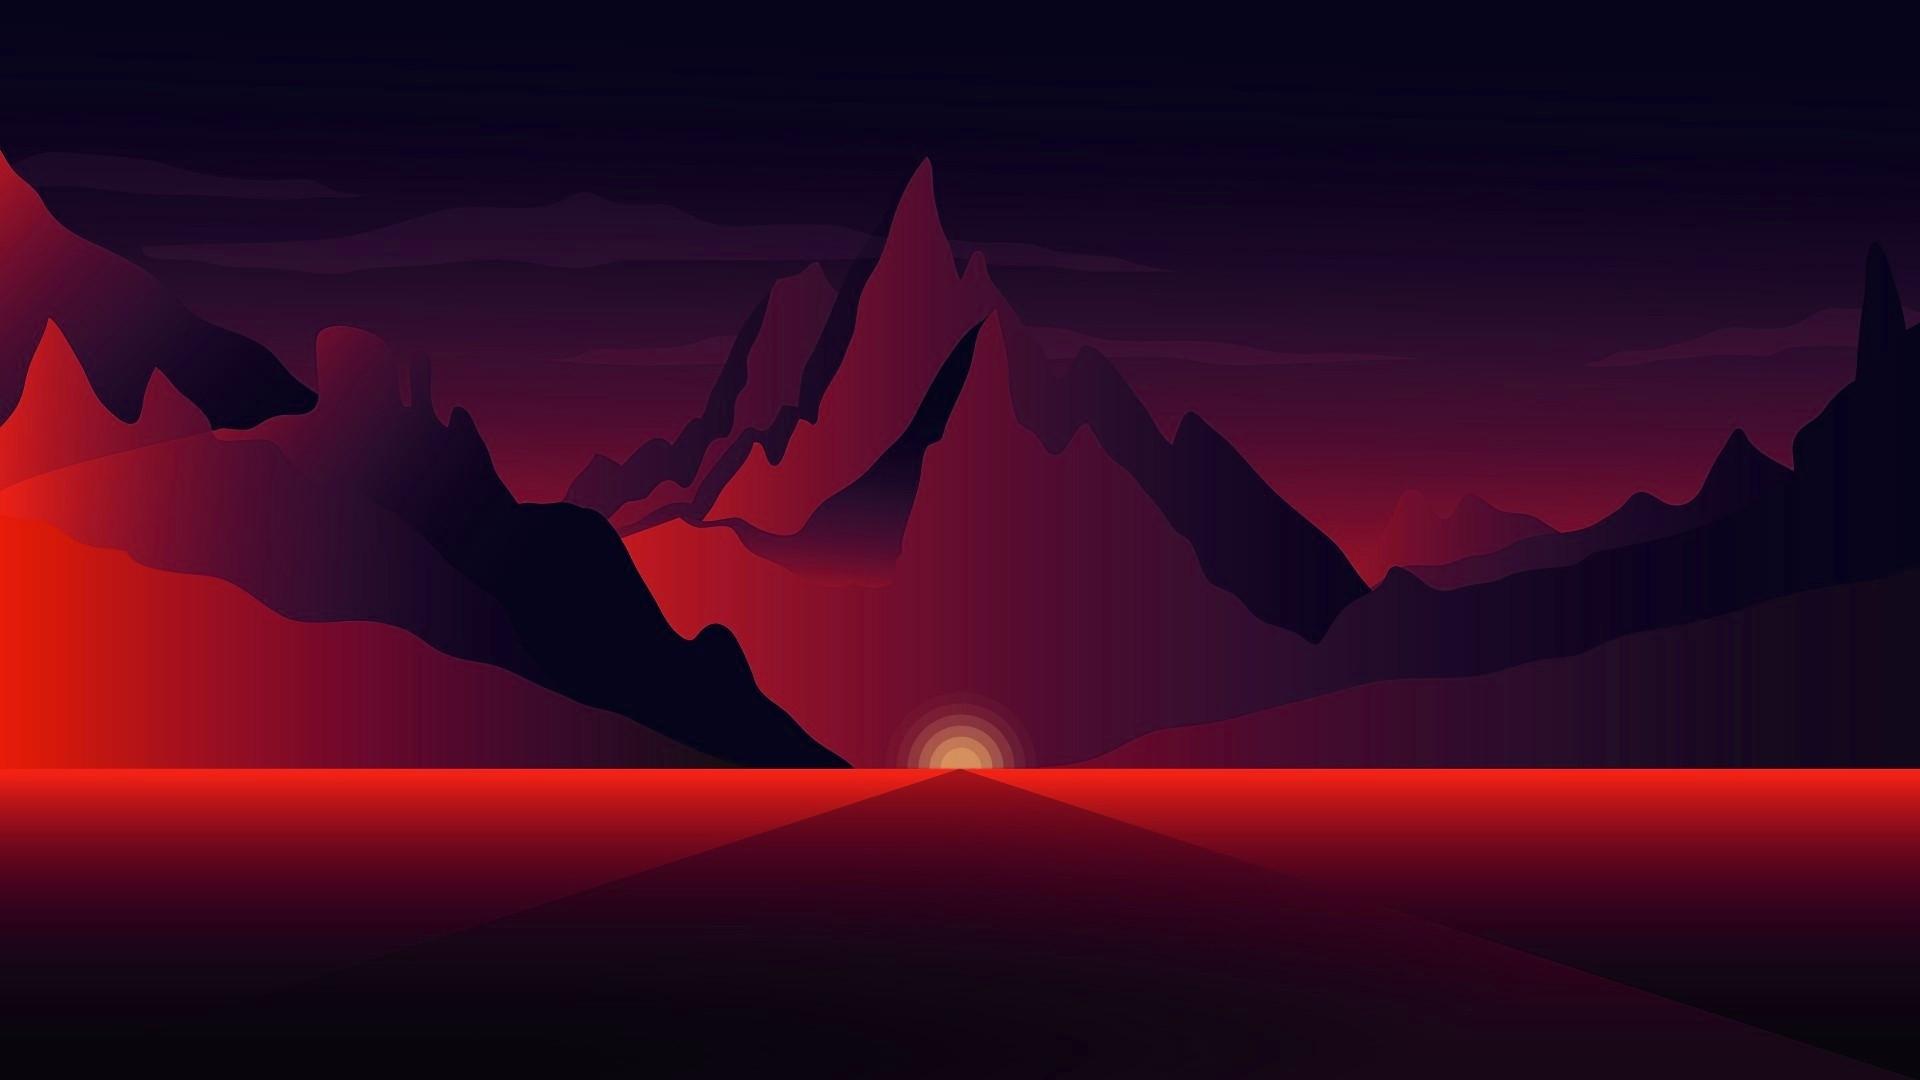 Dark Mountain PC Wallpaper